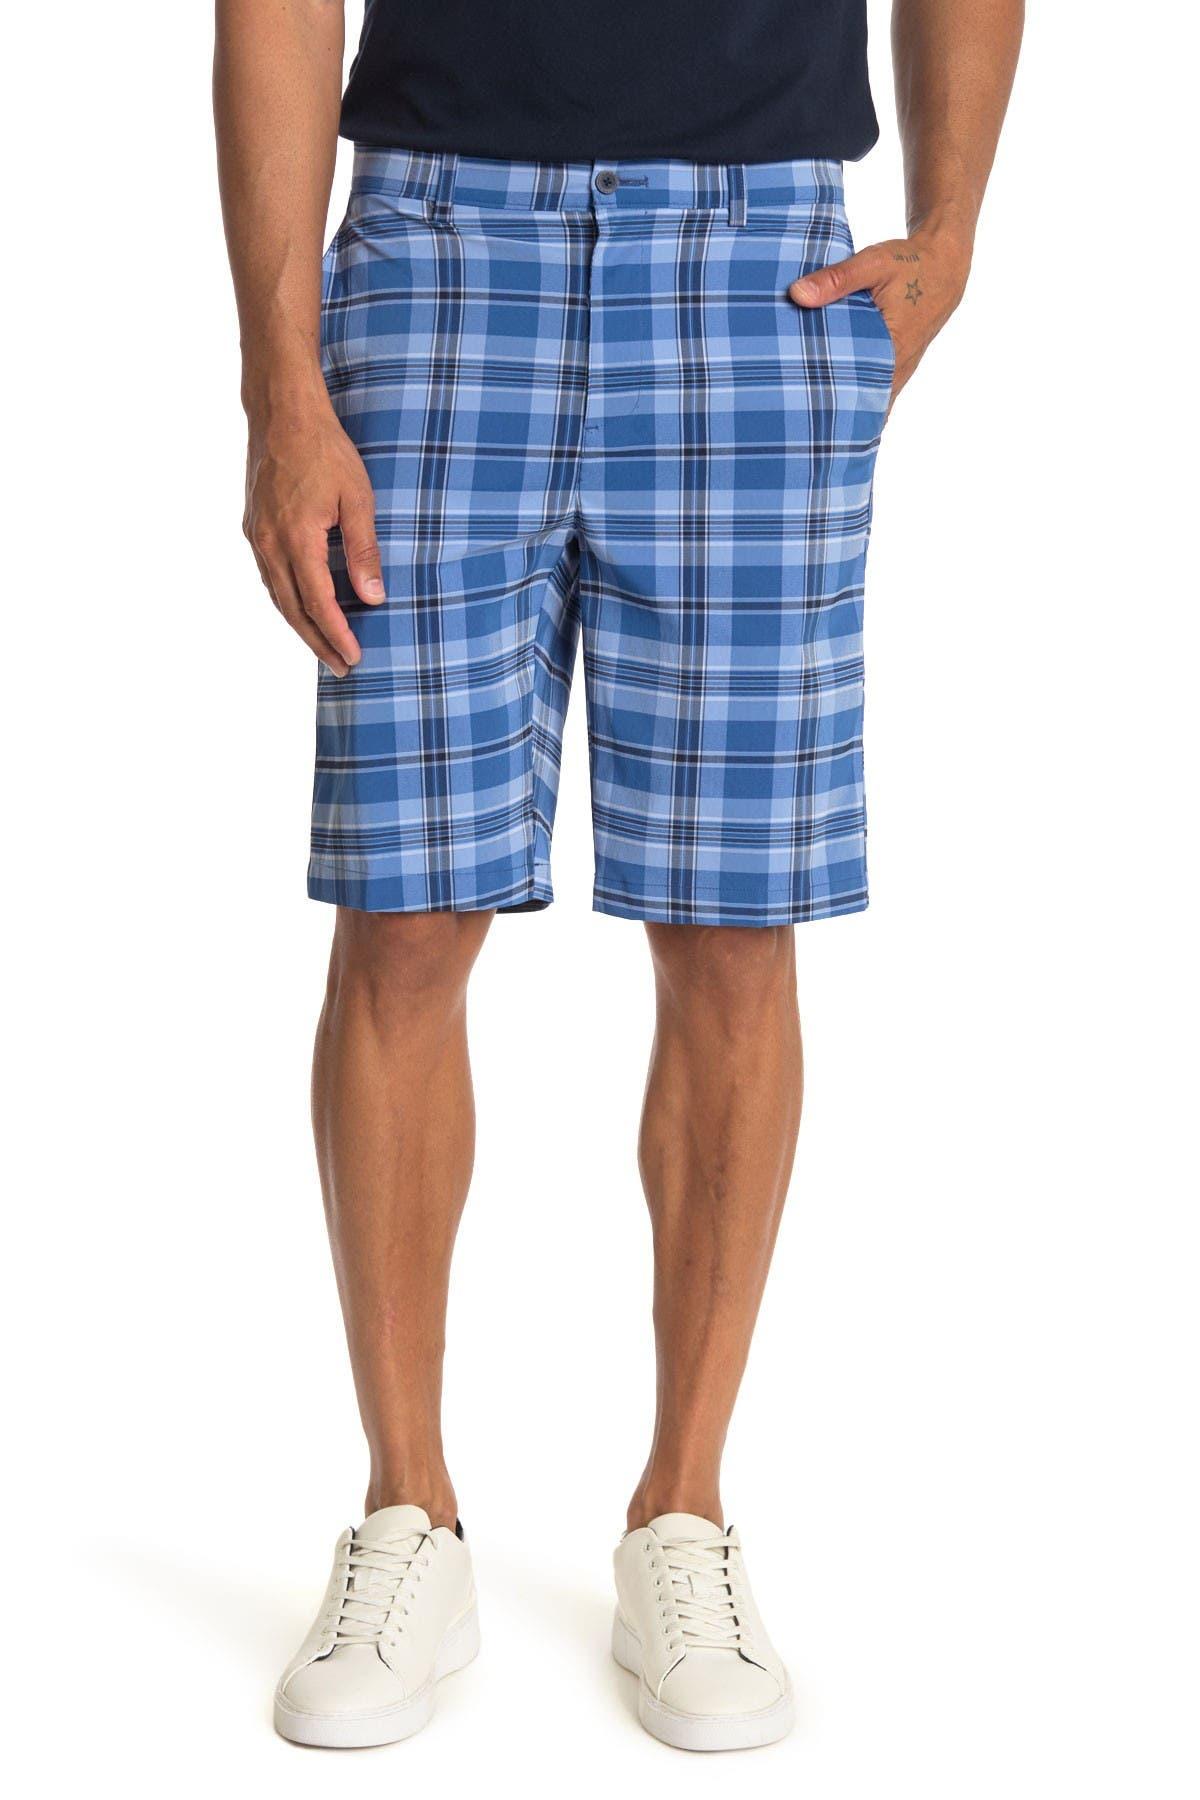 Image of Jack Nicklaus Plaid Printed Shorts